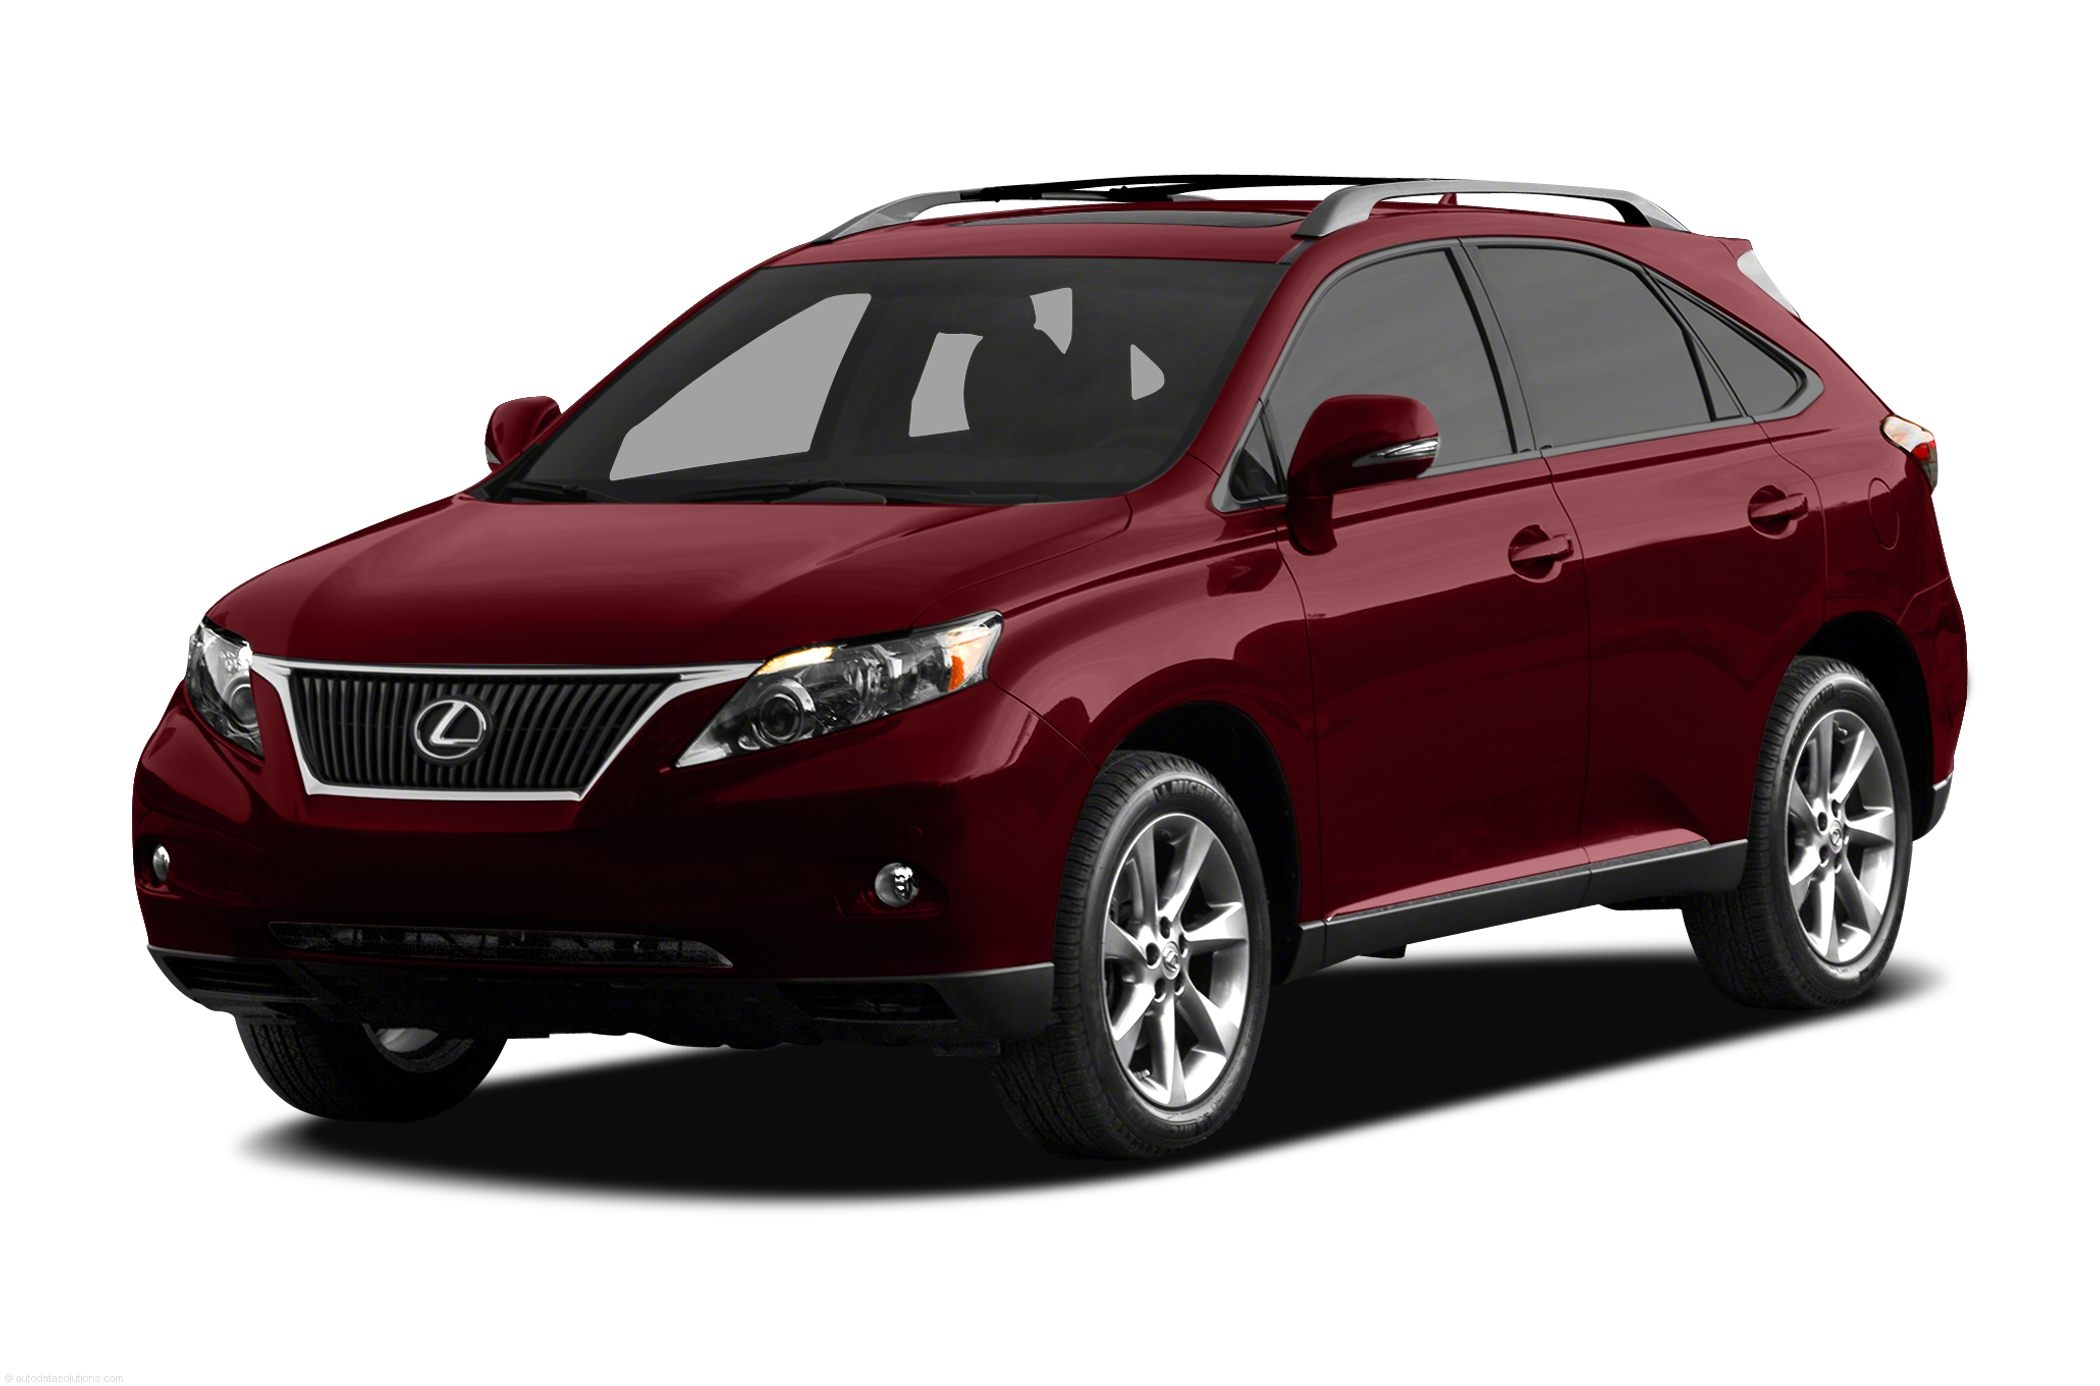 cost of lexus rx 350 autoneclub lexus invoice price